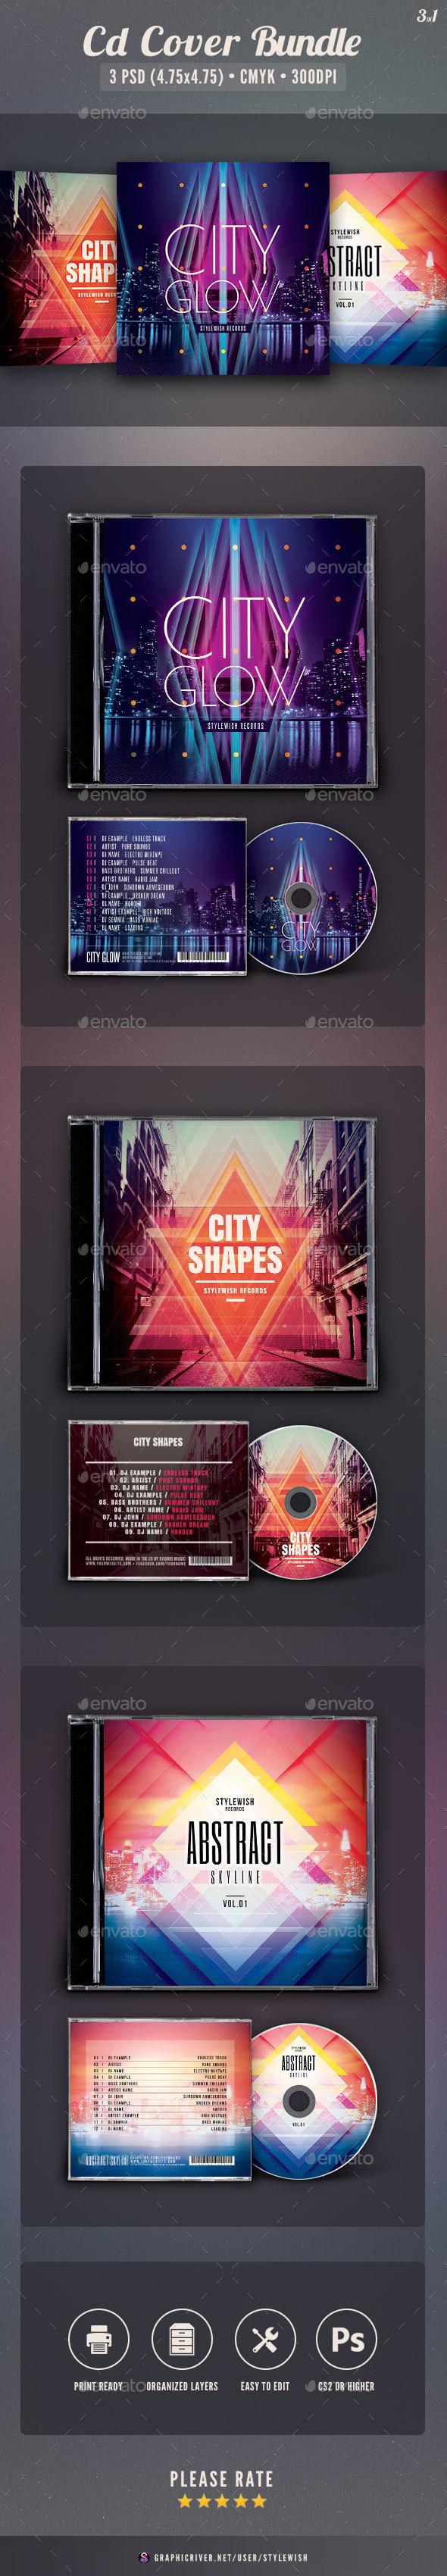 City CD Cover Bundle Vol.03 - CD & DVD Artwork Print Templates